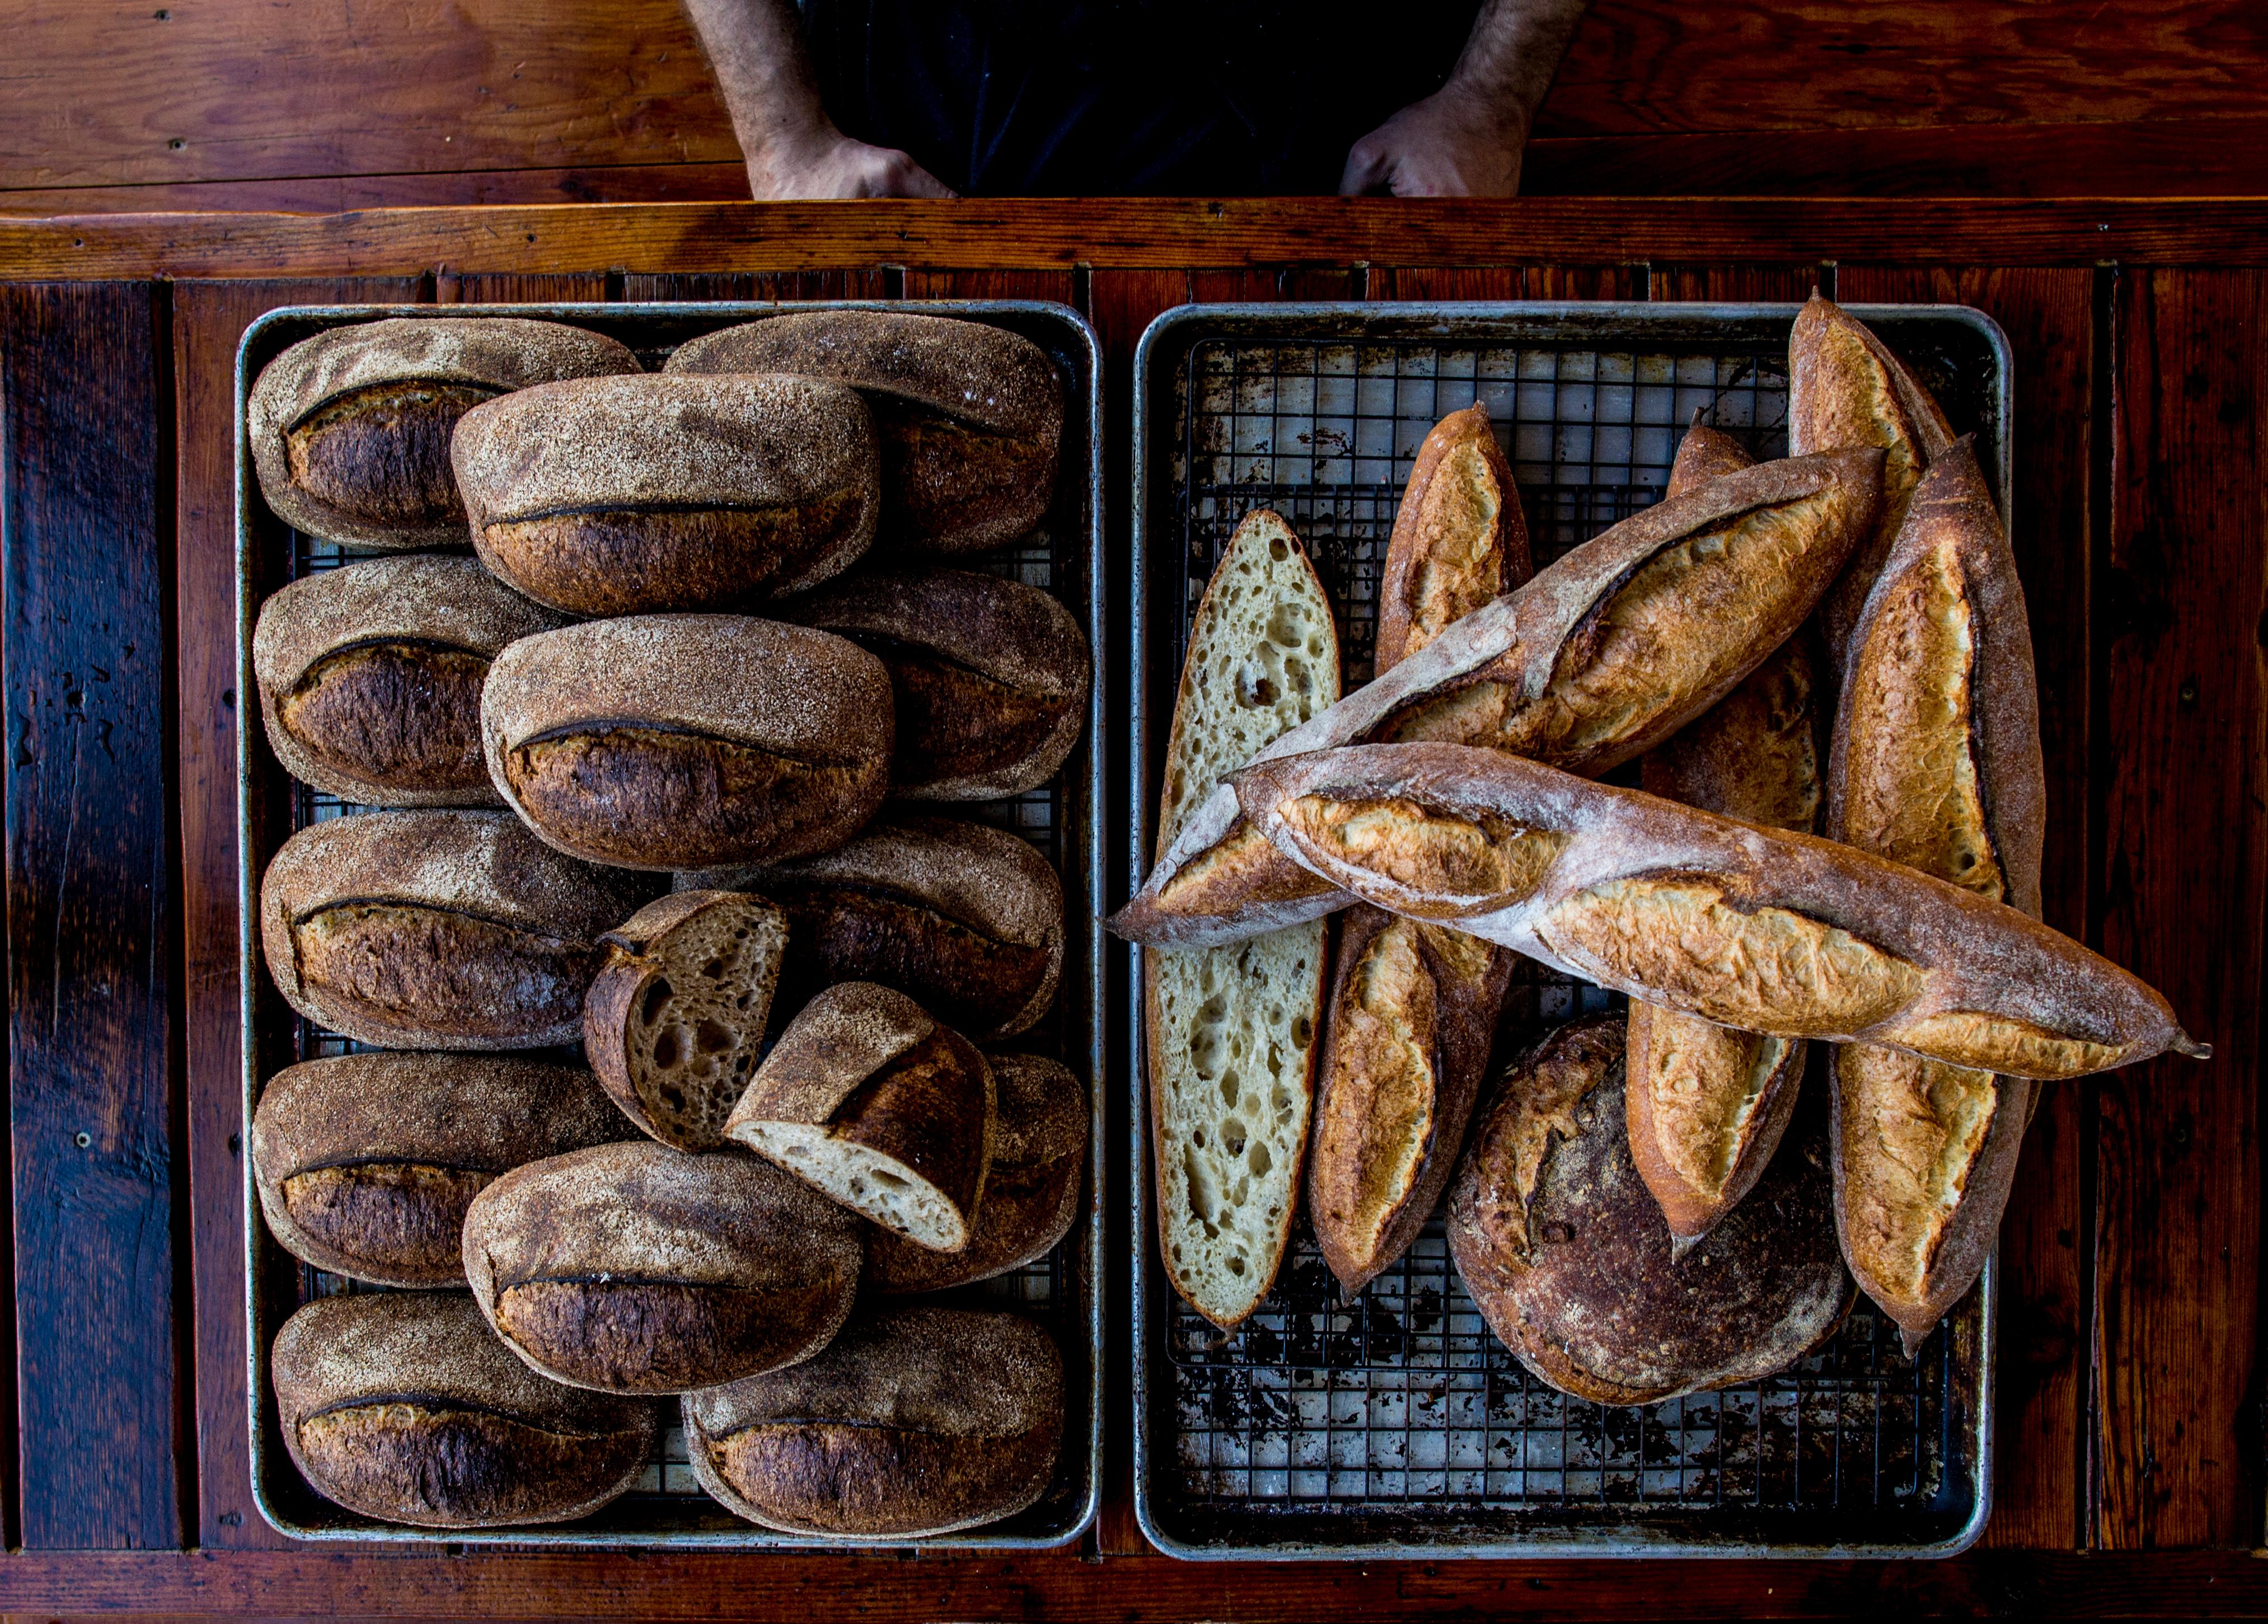 Odd Duck's breads